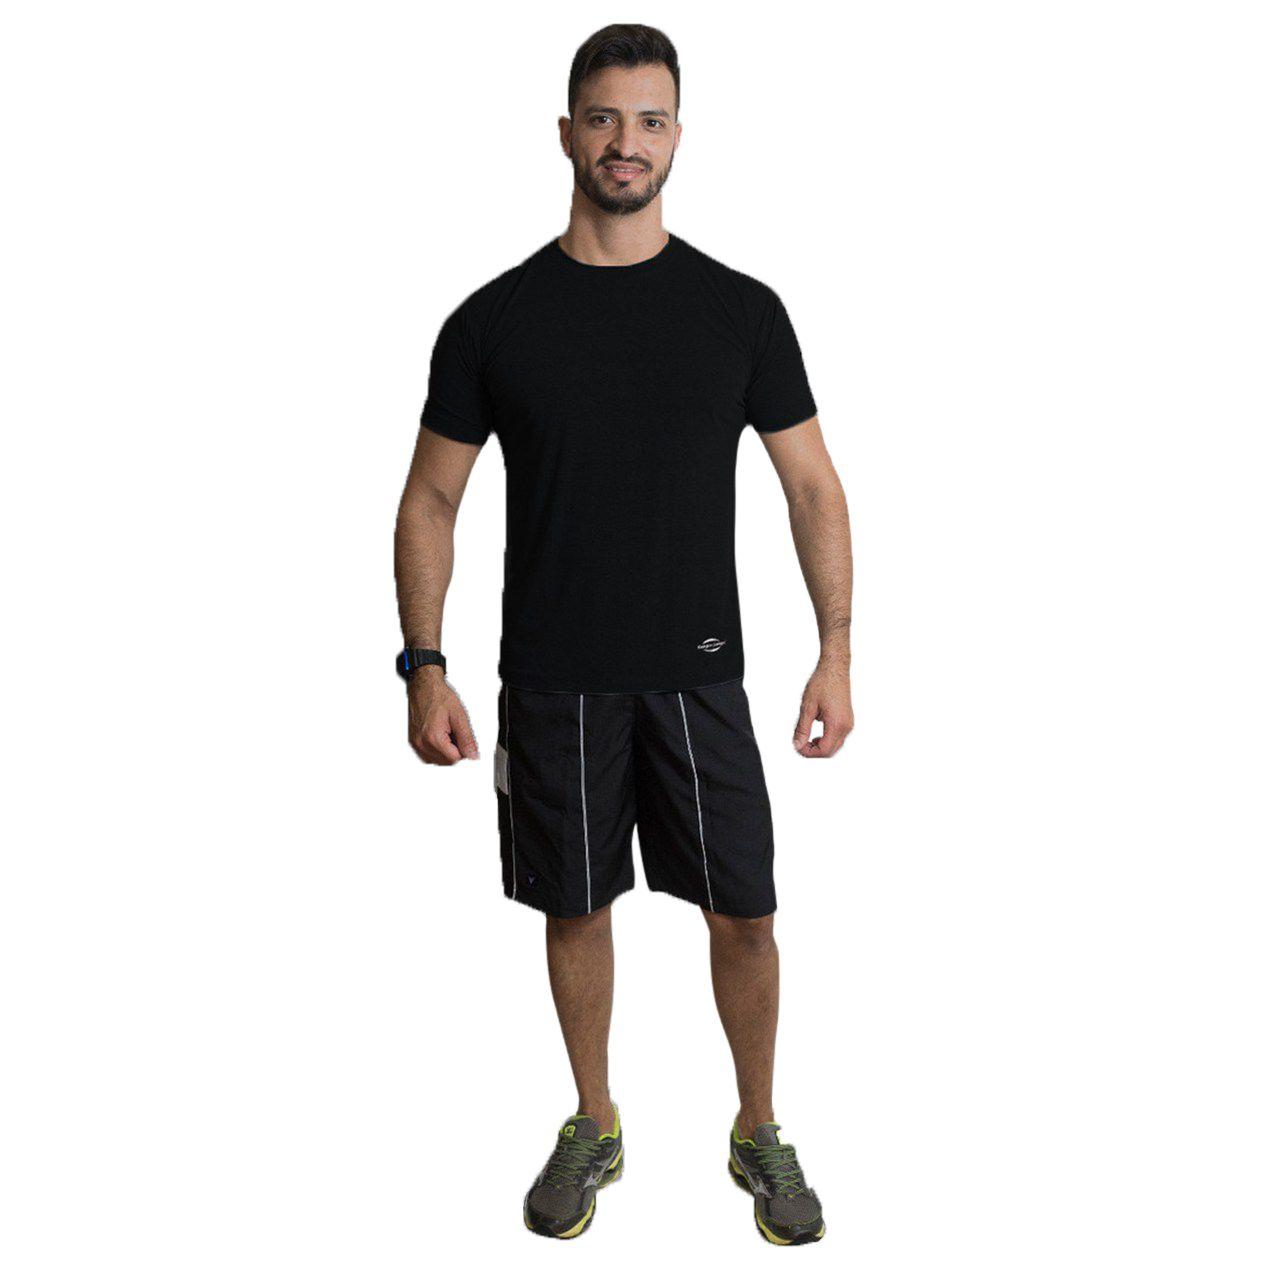 Camiseta Básica Kangoo Jumps Dry Fit Masculino